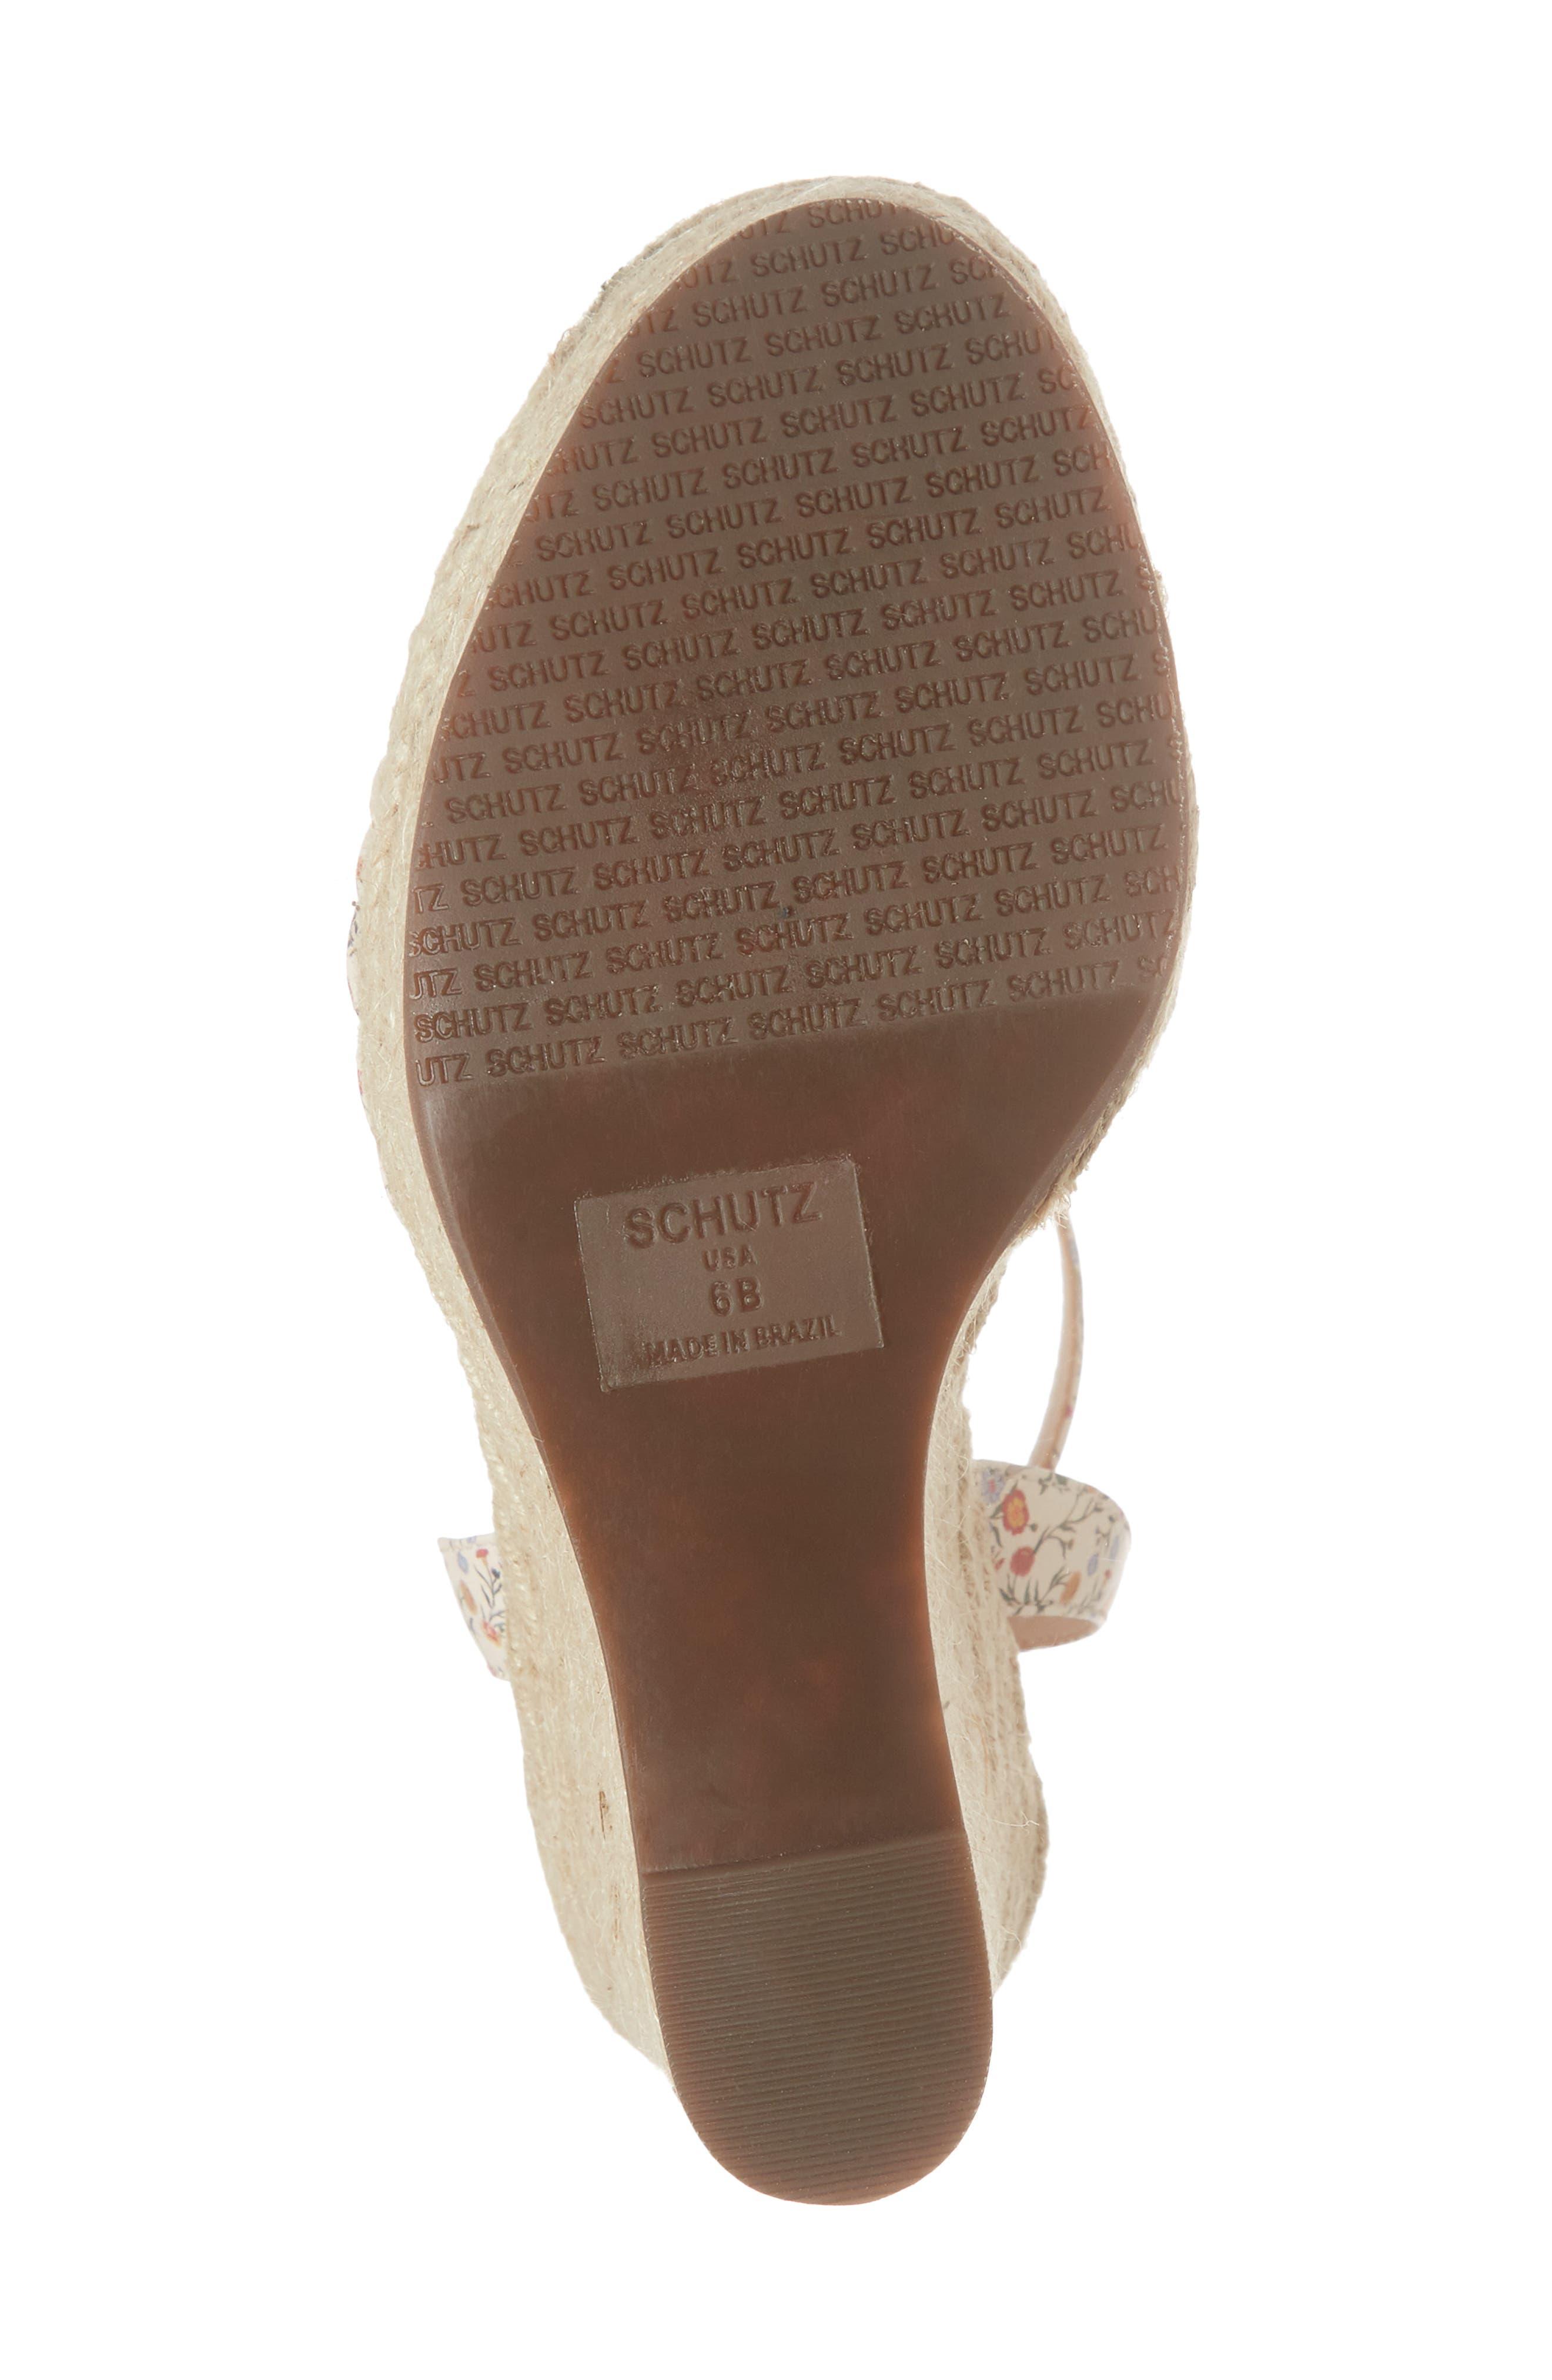 SCHUTZ, Gianne Platform Wedge Sandal, Alternate thumbnail 6, color, FLORAL LEATHER